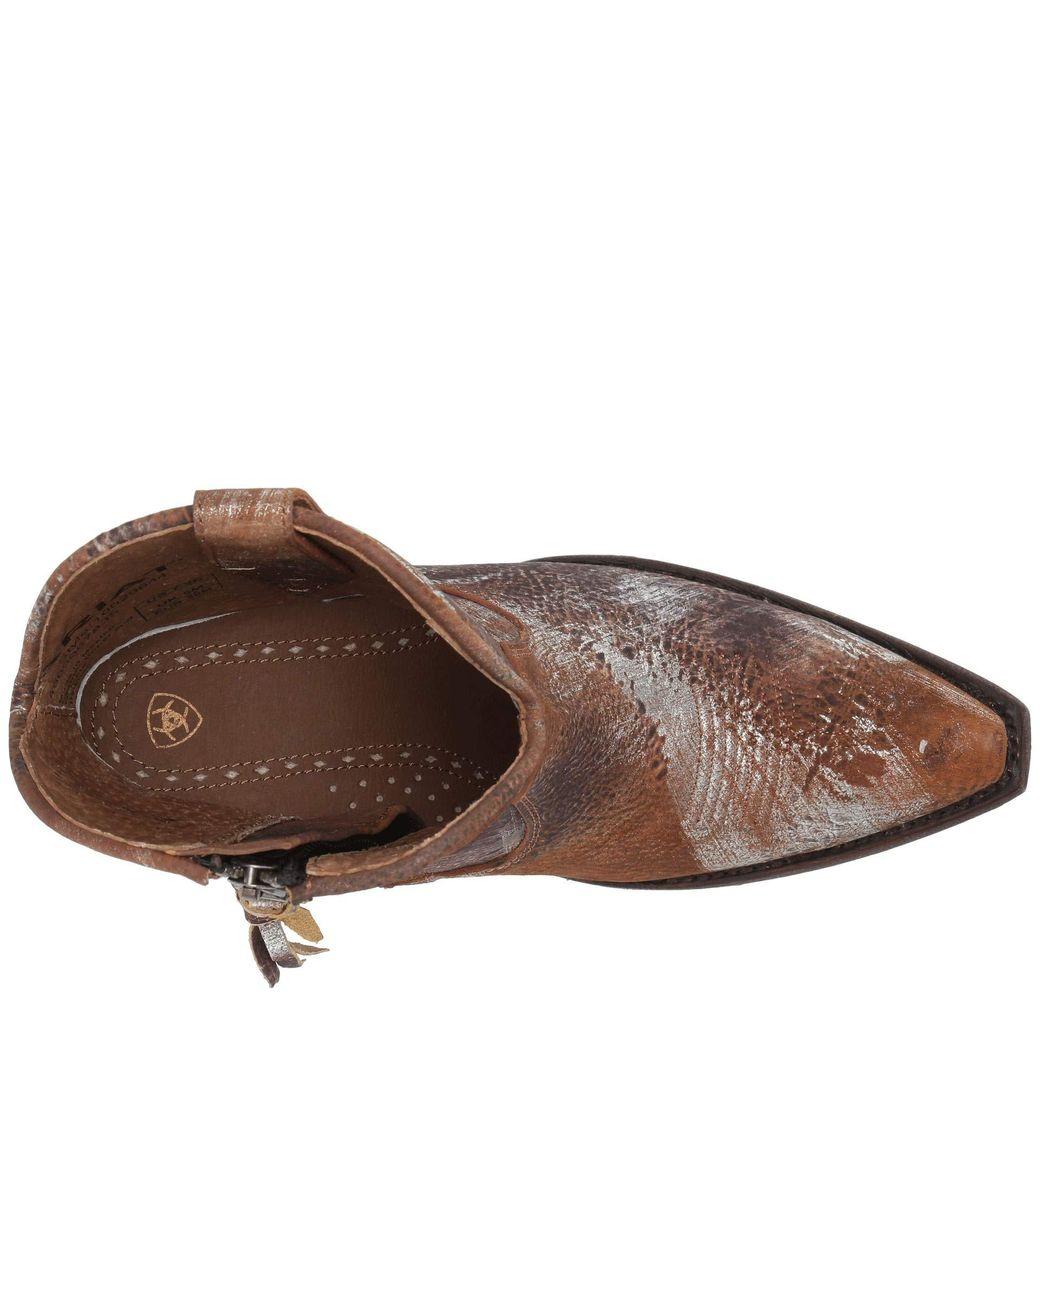 Ariat Femme Circuit Champion Boot